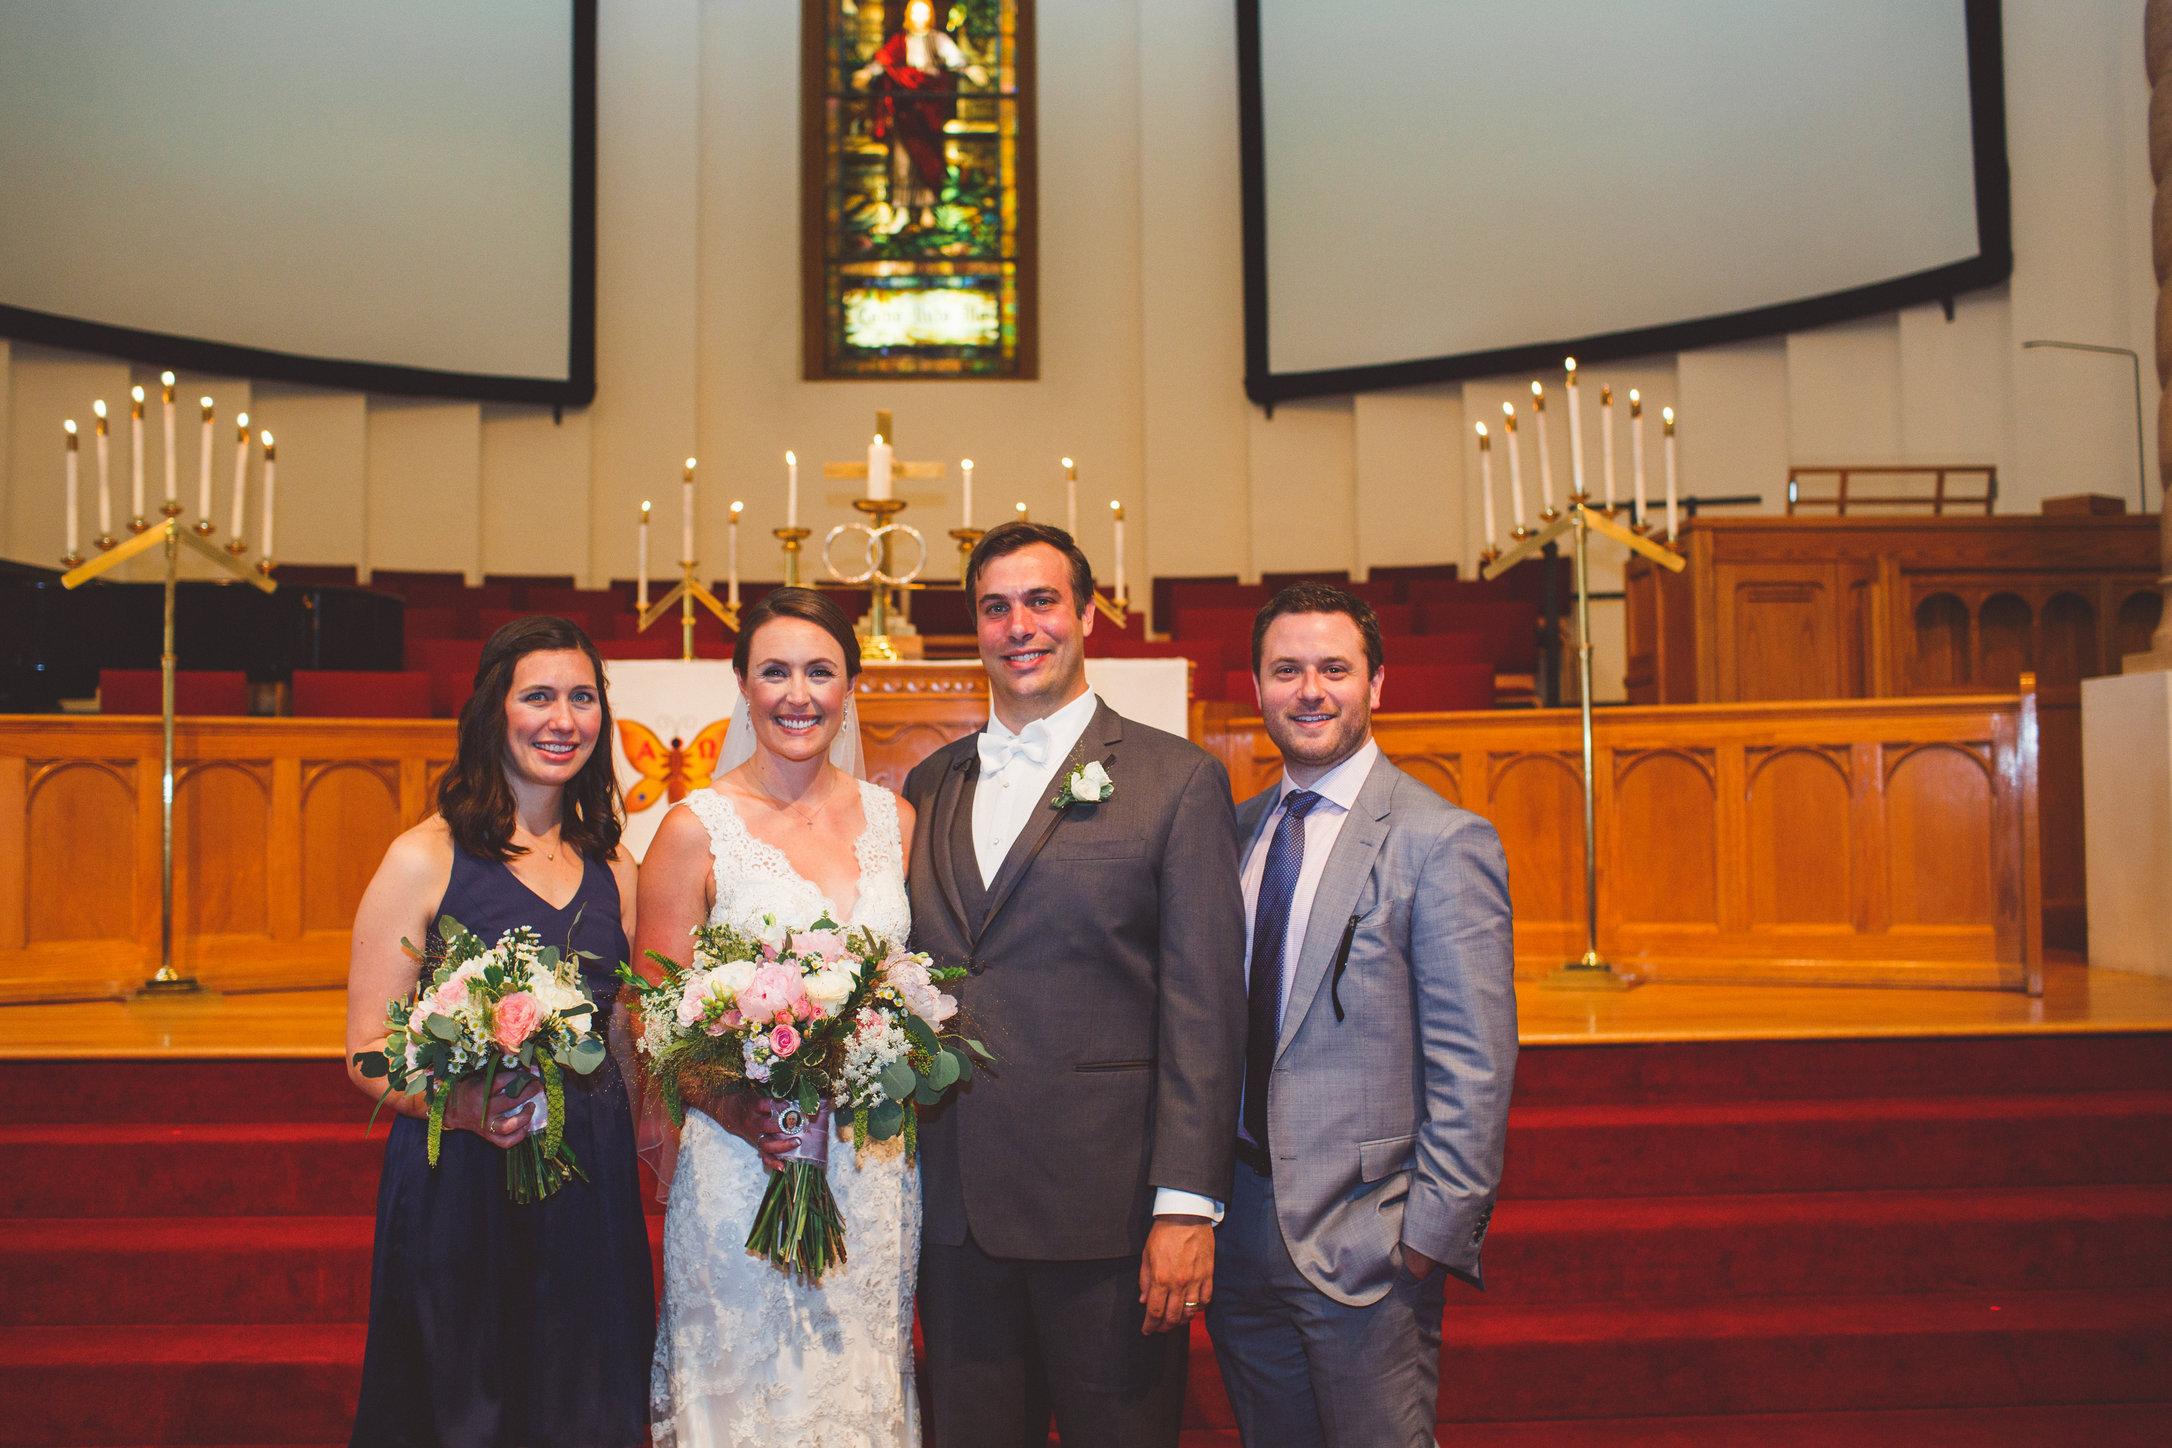 SandC-wedding-261.jpg